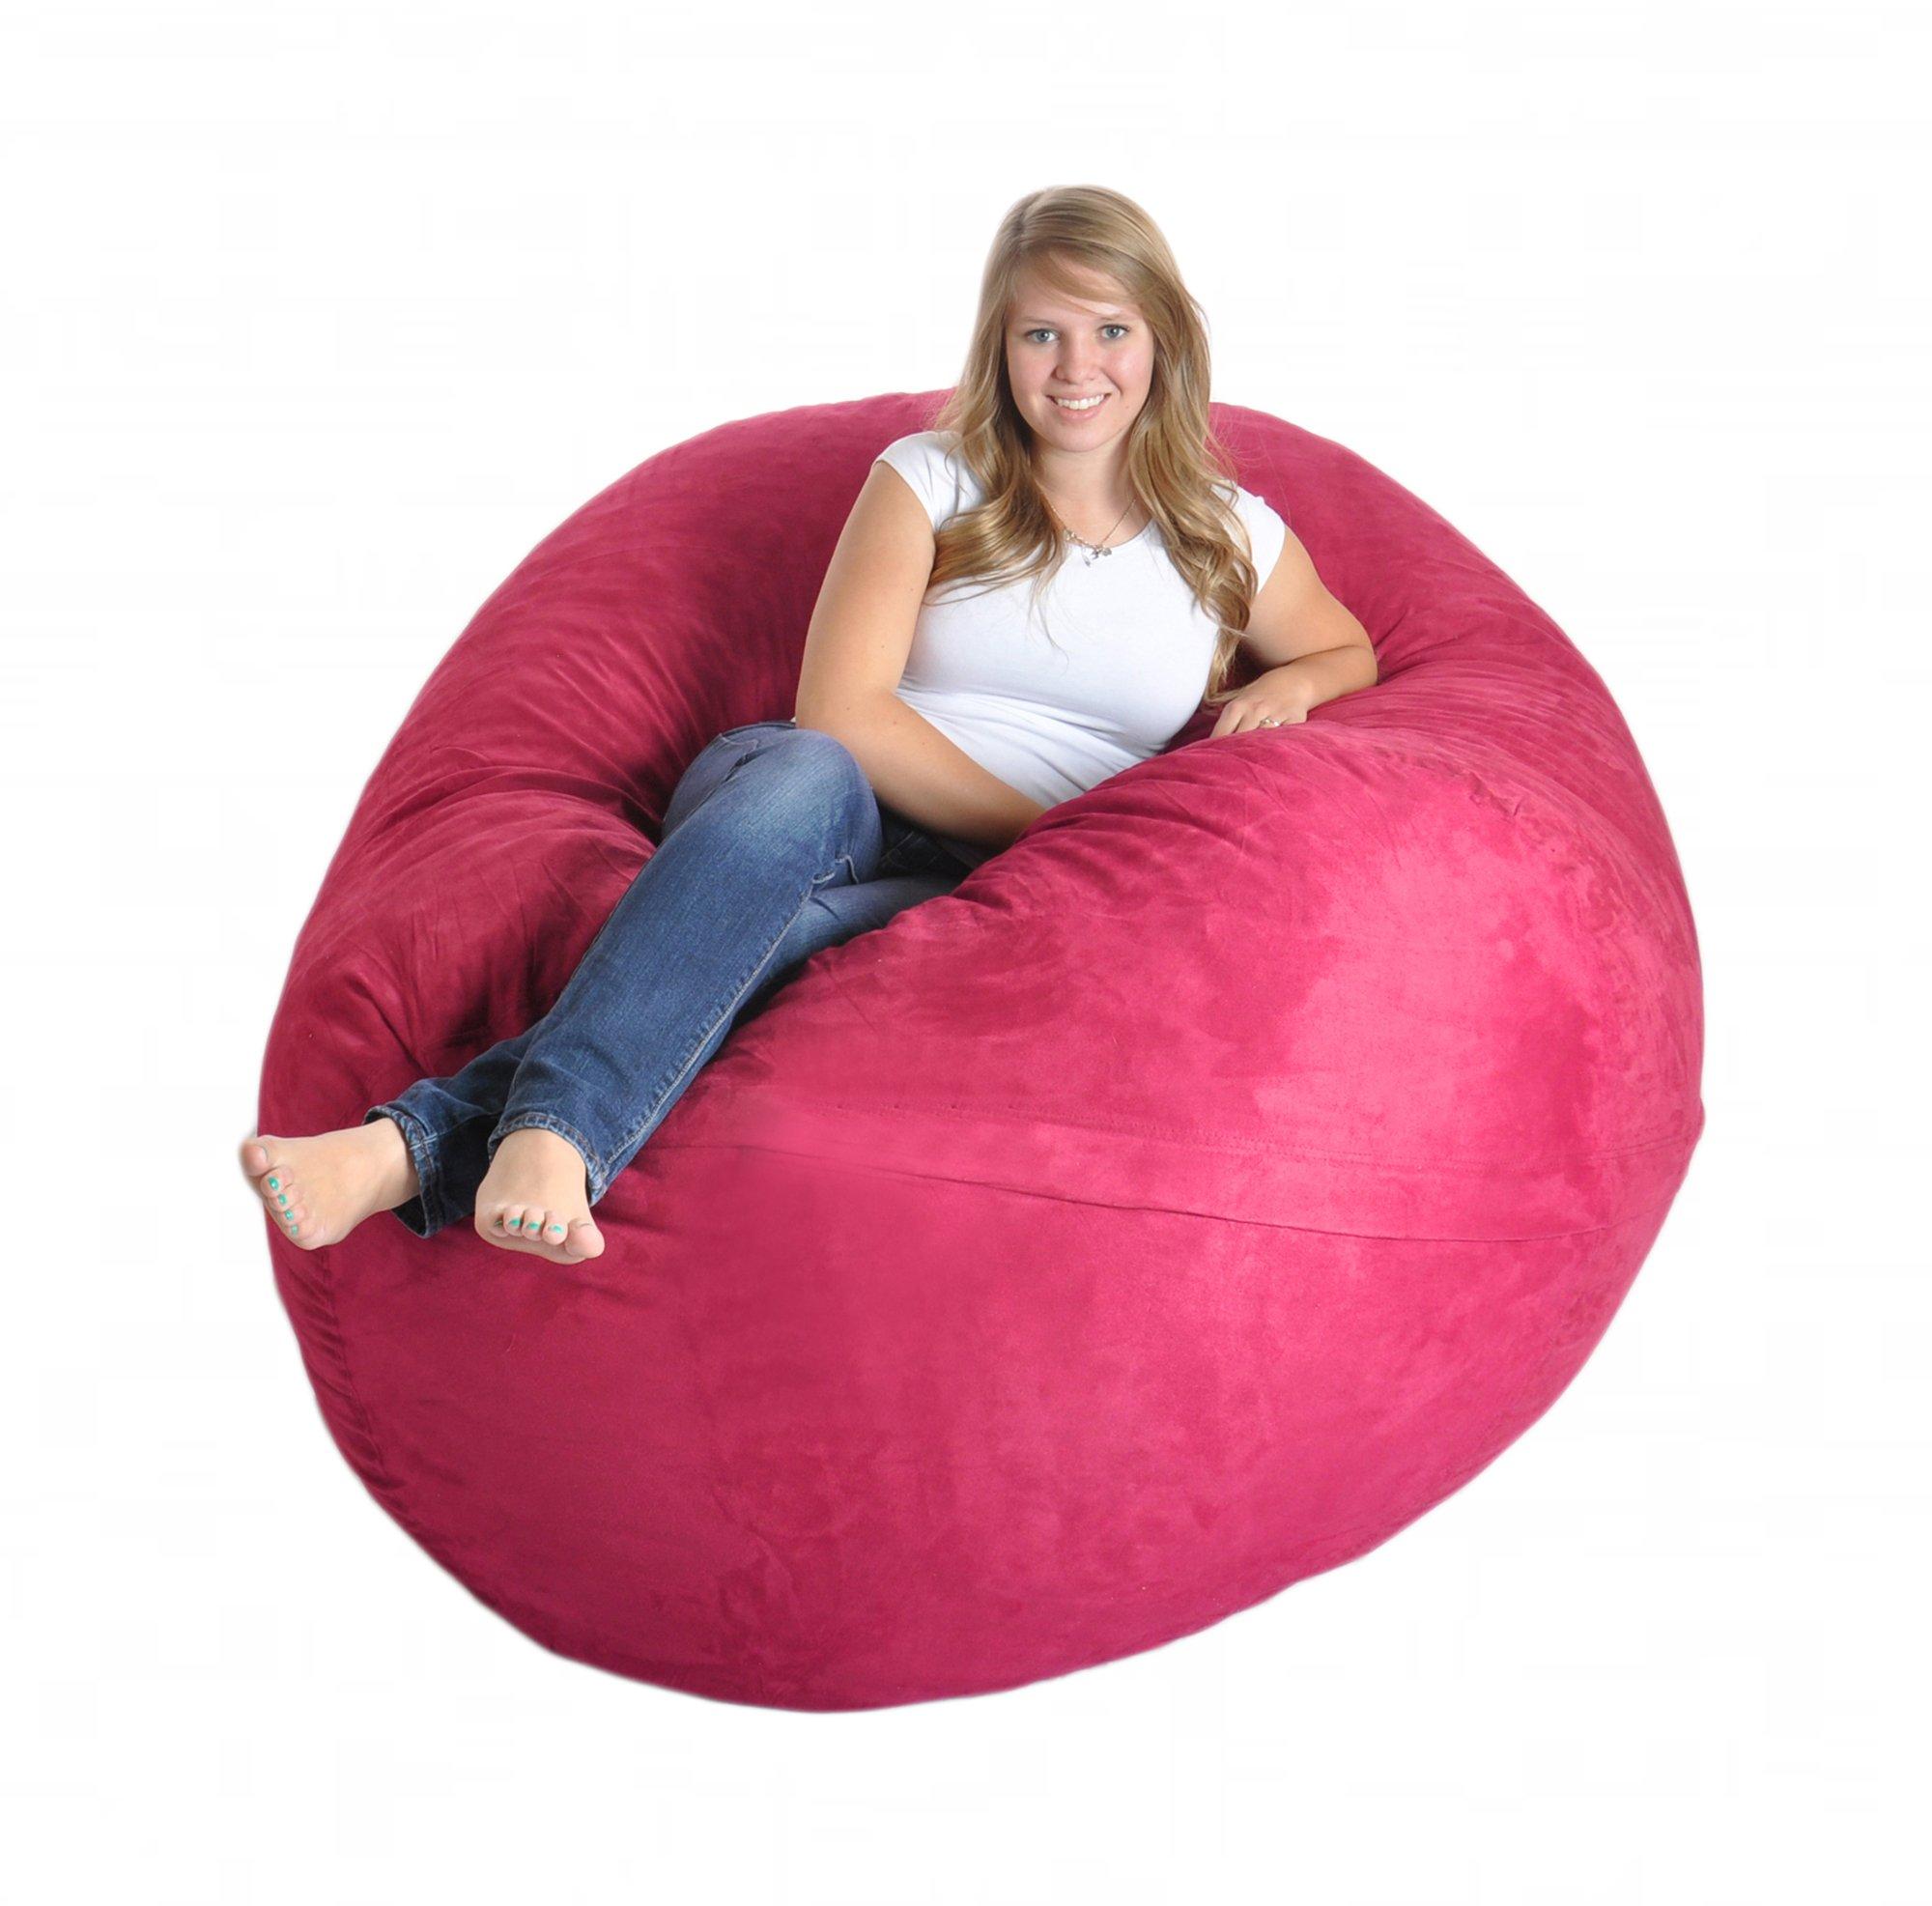 SLACKER sack 6-Feet Foam Microsuede Beanbag for Girls, X-Large, Hot Pink